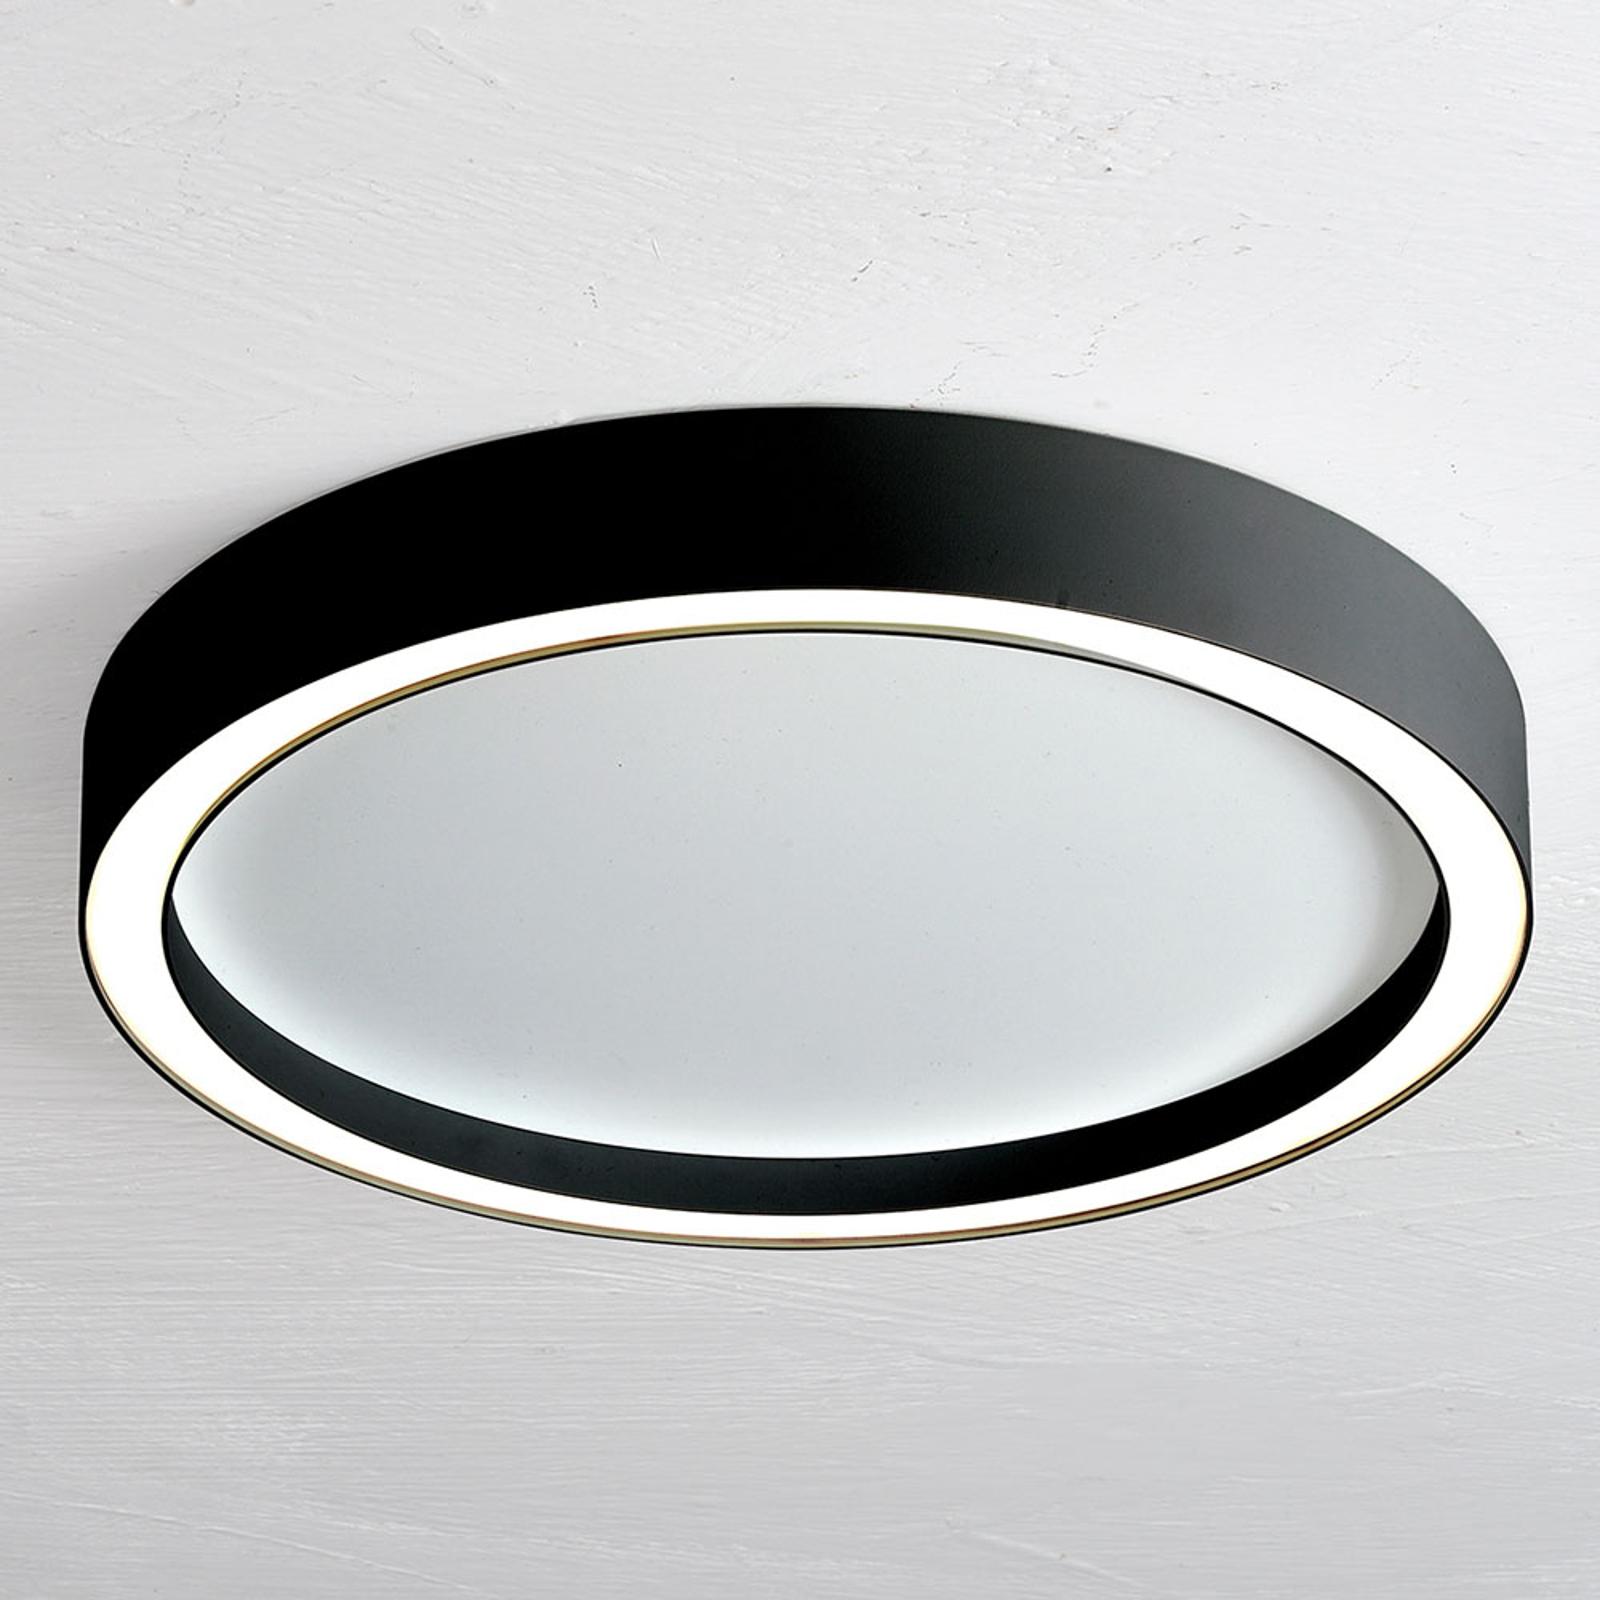 Bopp Aura lampa sufitowa LED Ø 55cm biała/czarna